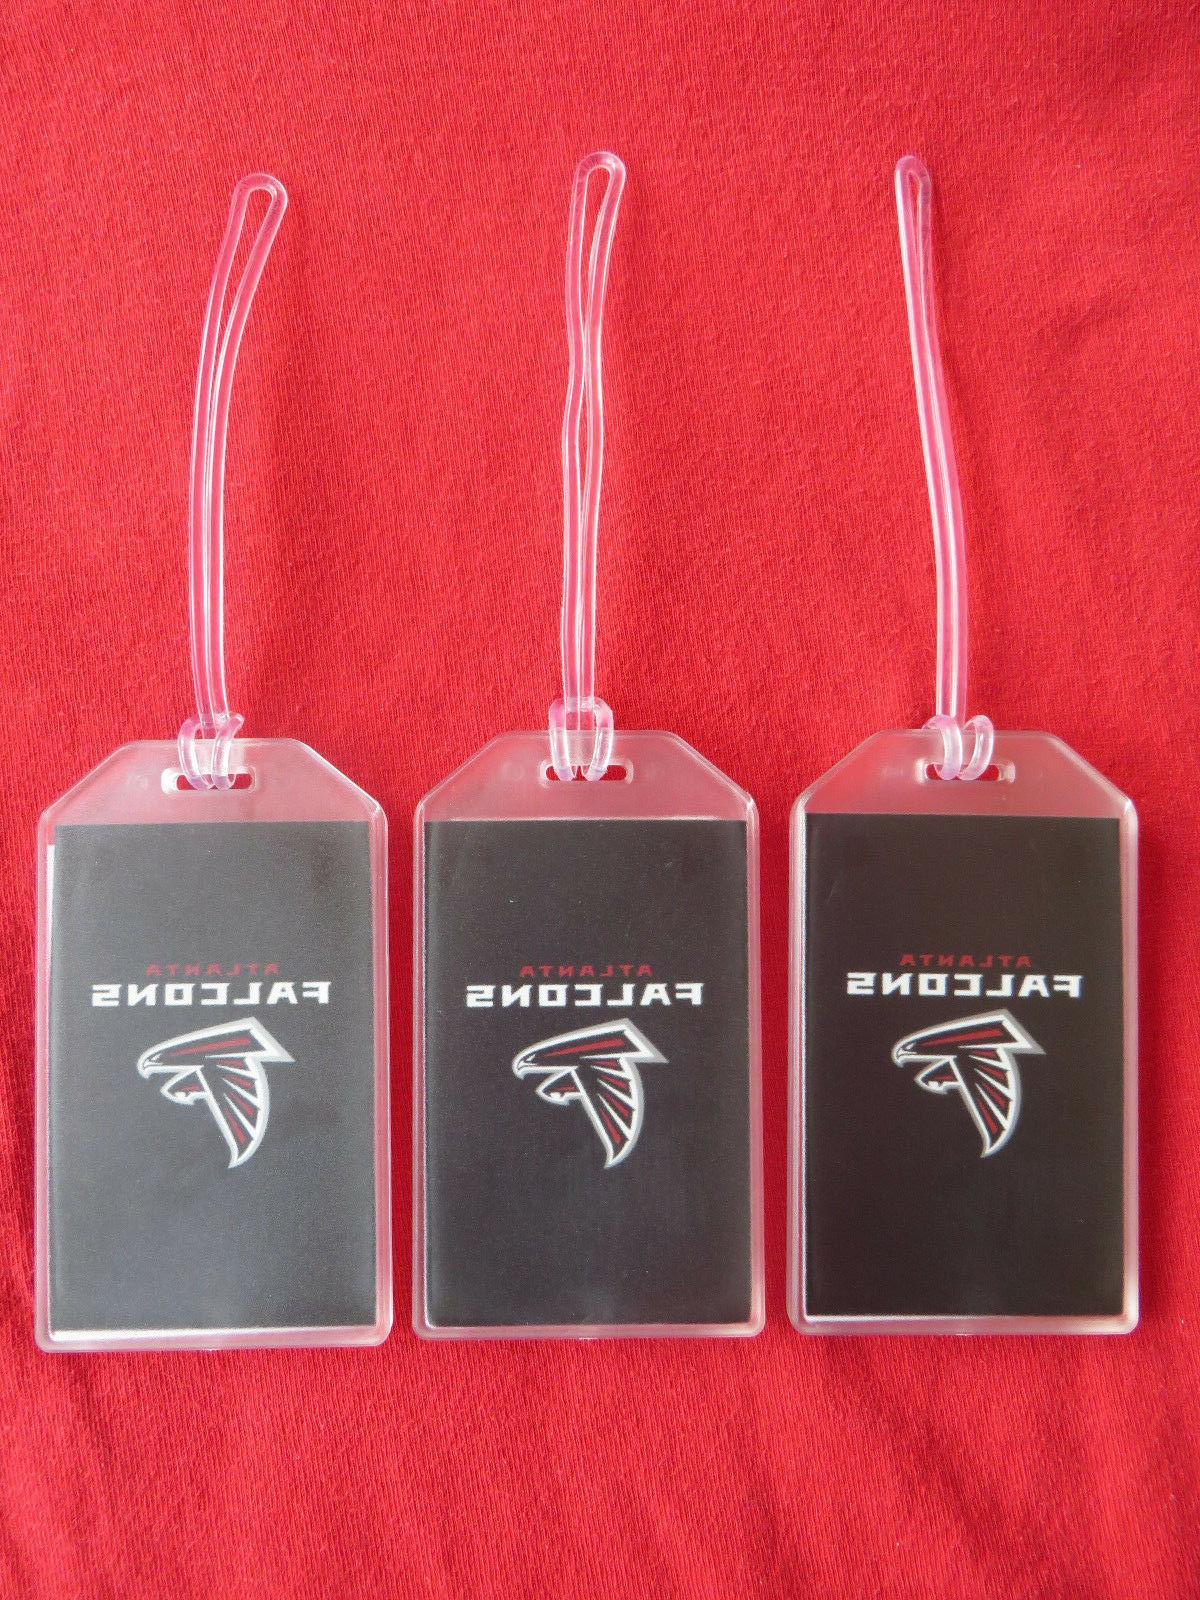 atlanta falcons logo football luggage tags 3